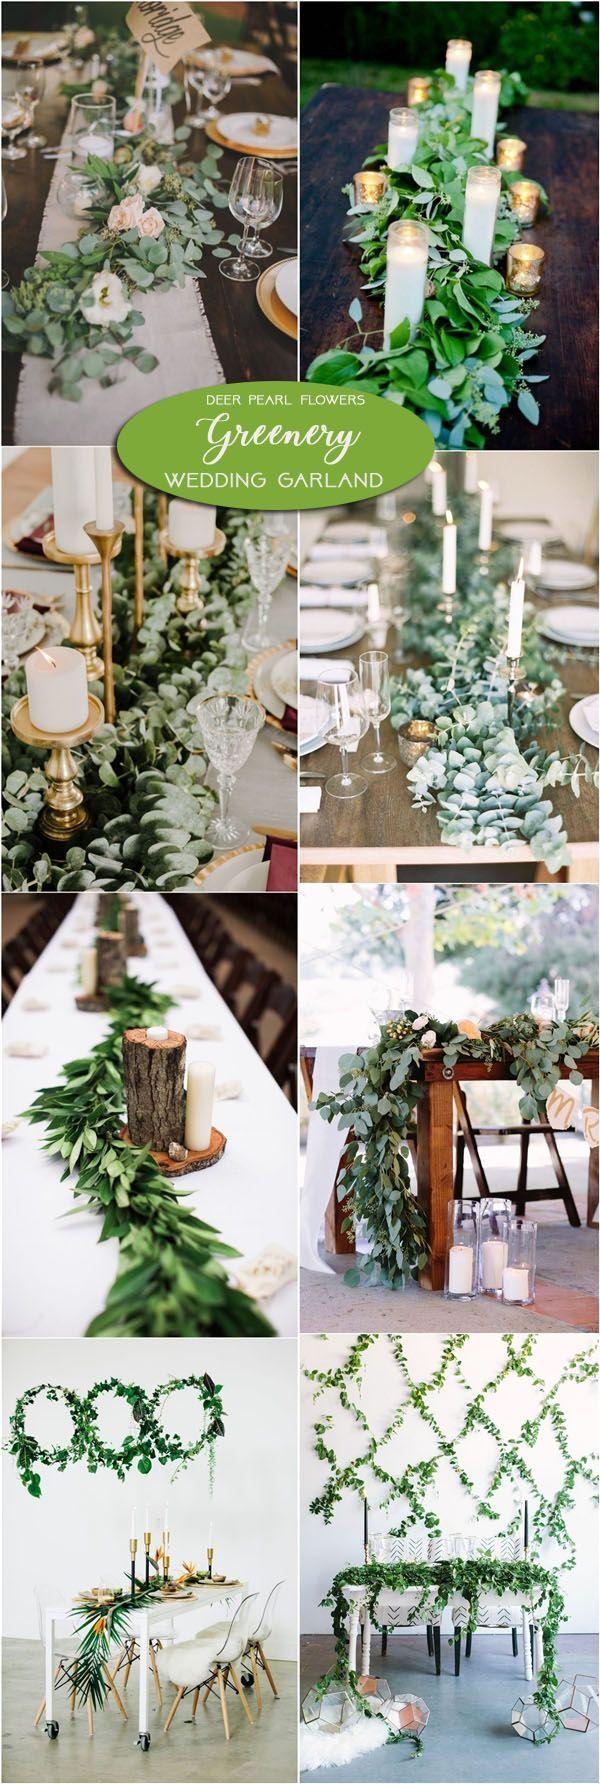 Best greenery centerpiece ideas on pinterest green